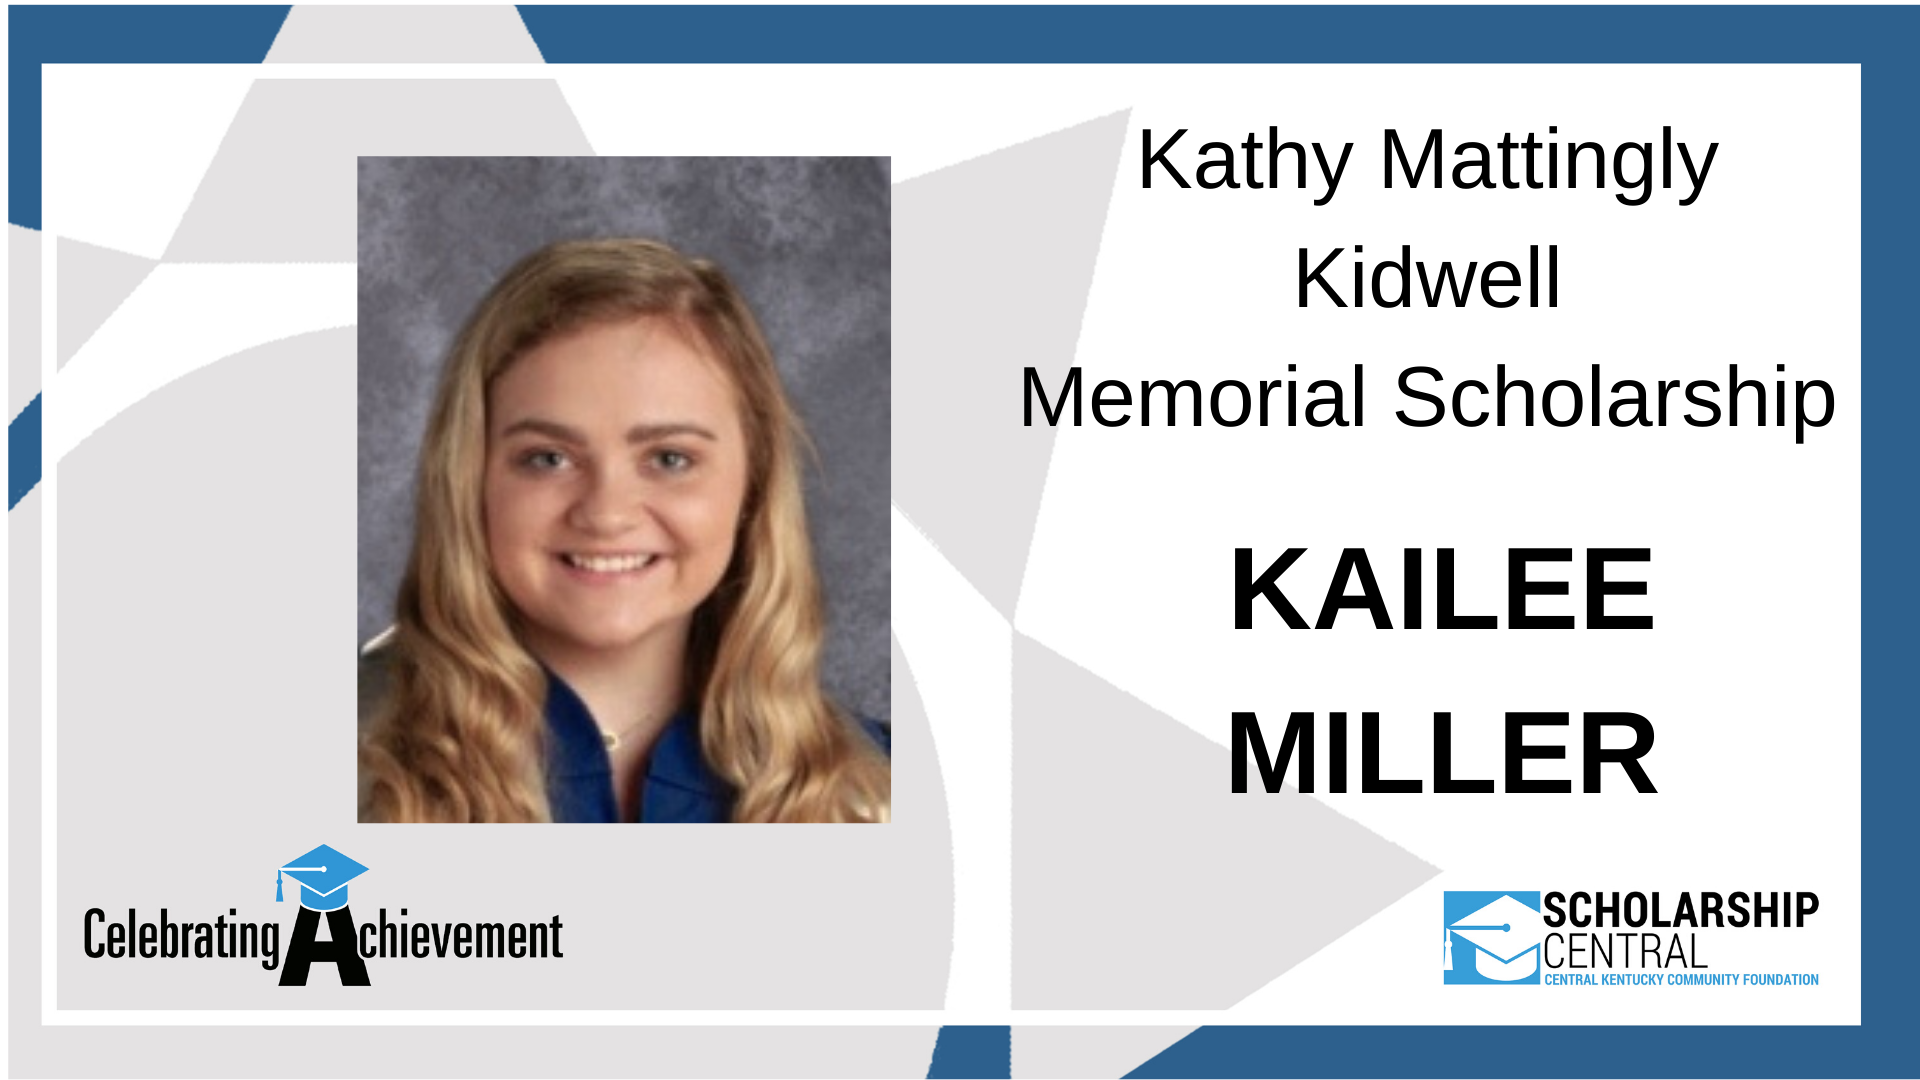 Kathy Mattingly Kidwell Scholarship